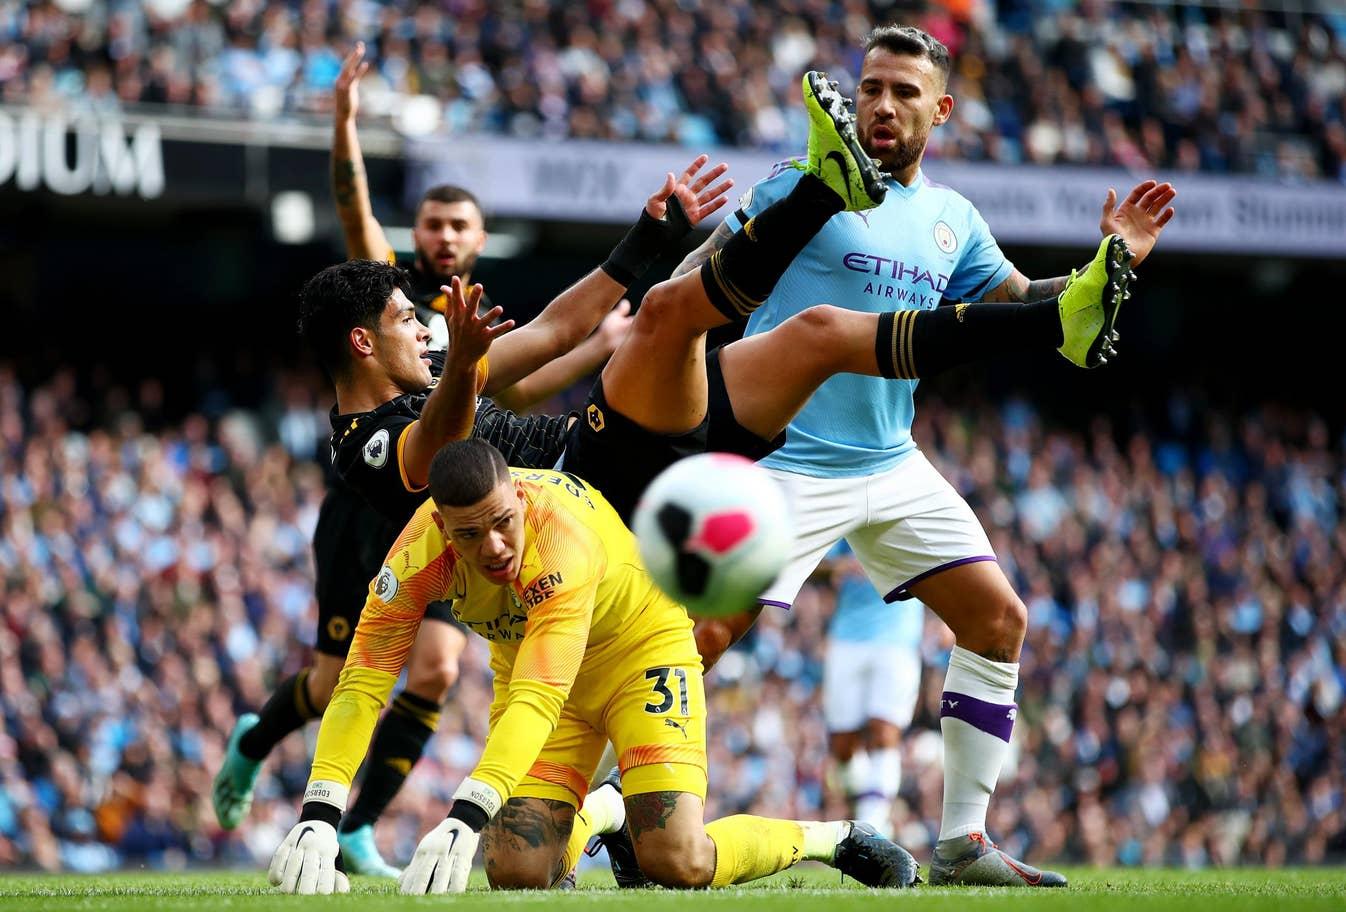 Liga Inggris: Manchester City Tumbang 0-2 di Etihad